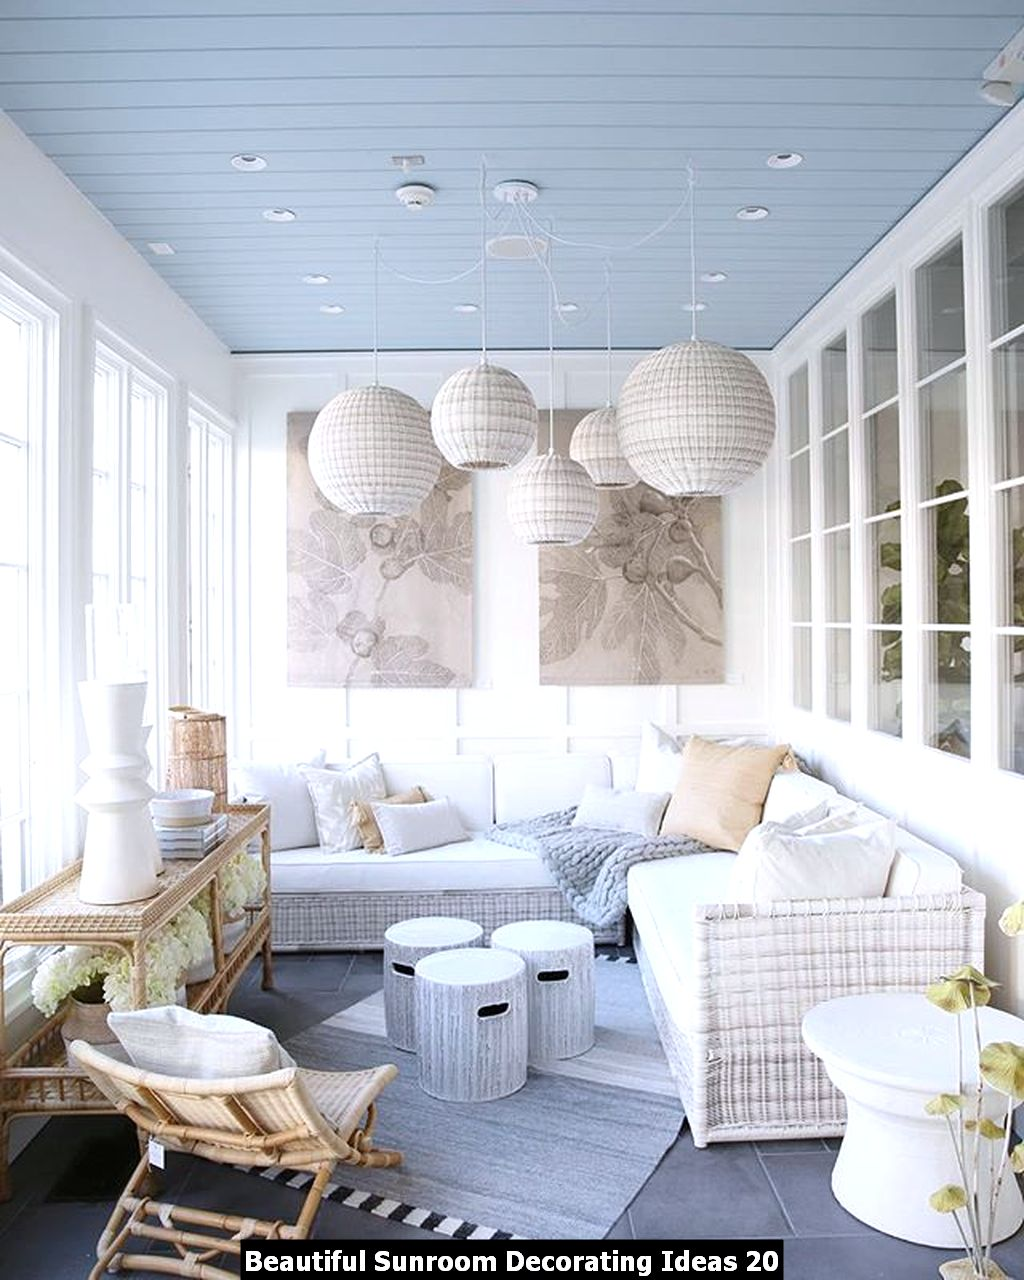 Beautiful Sunroom Decorating Ideas 20